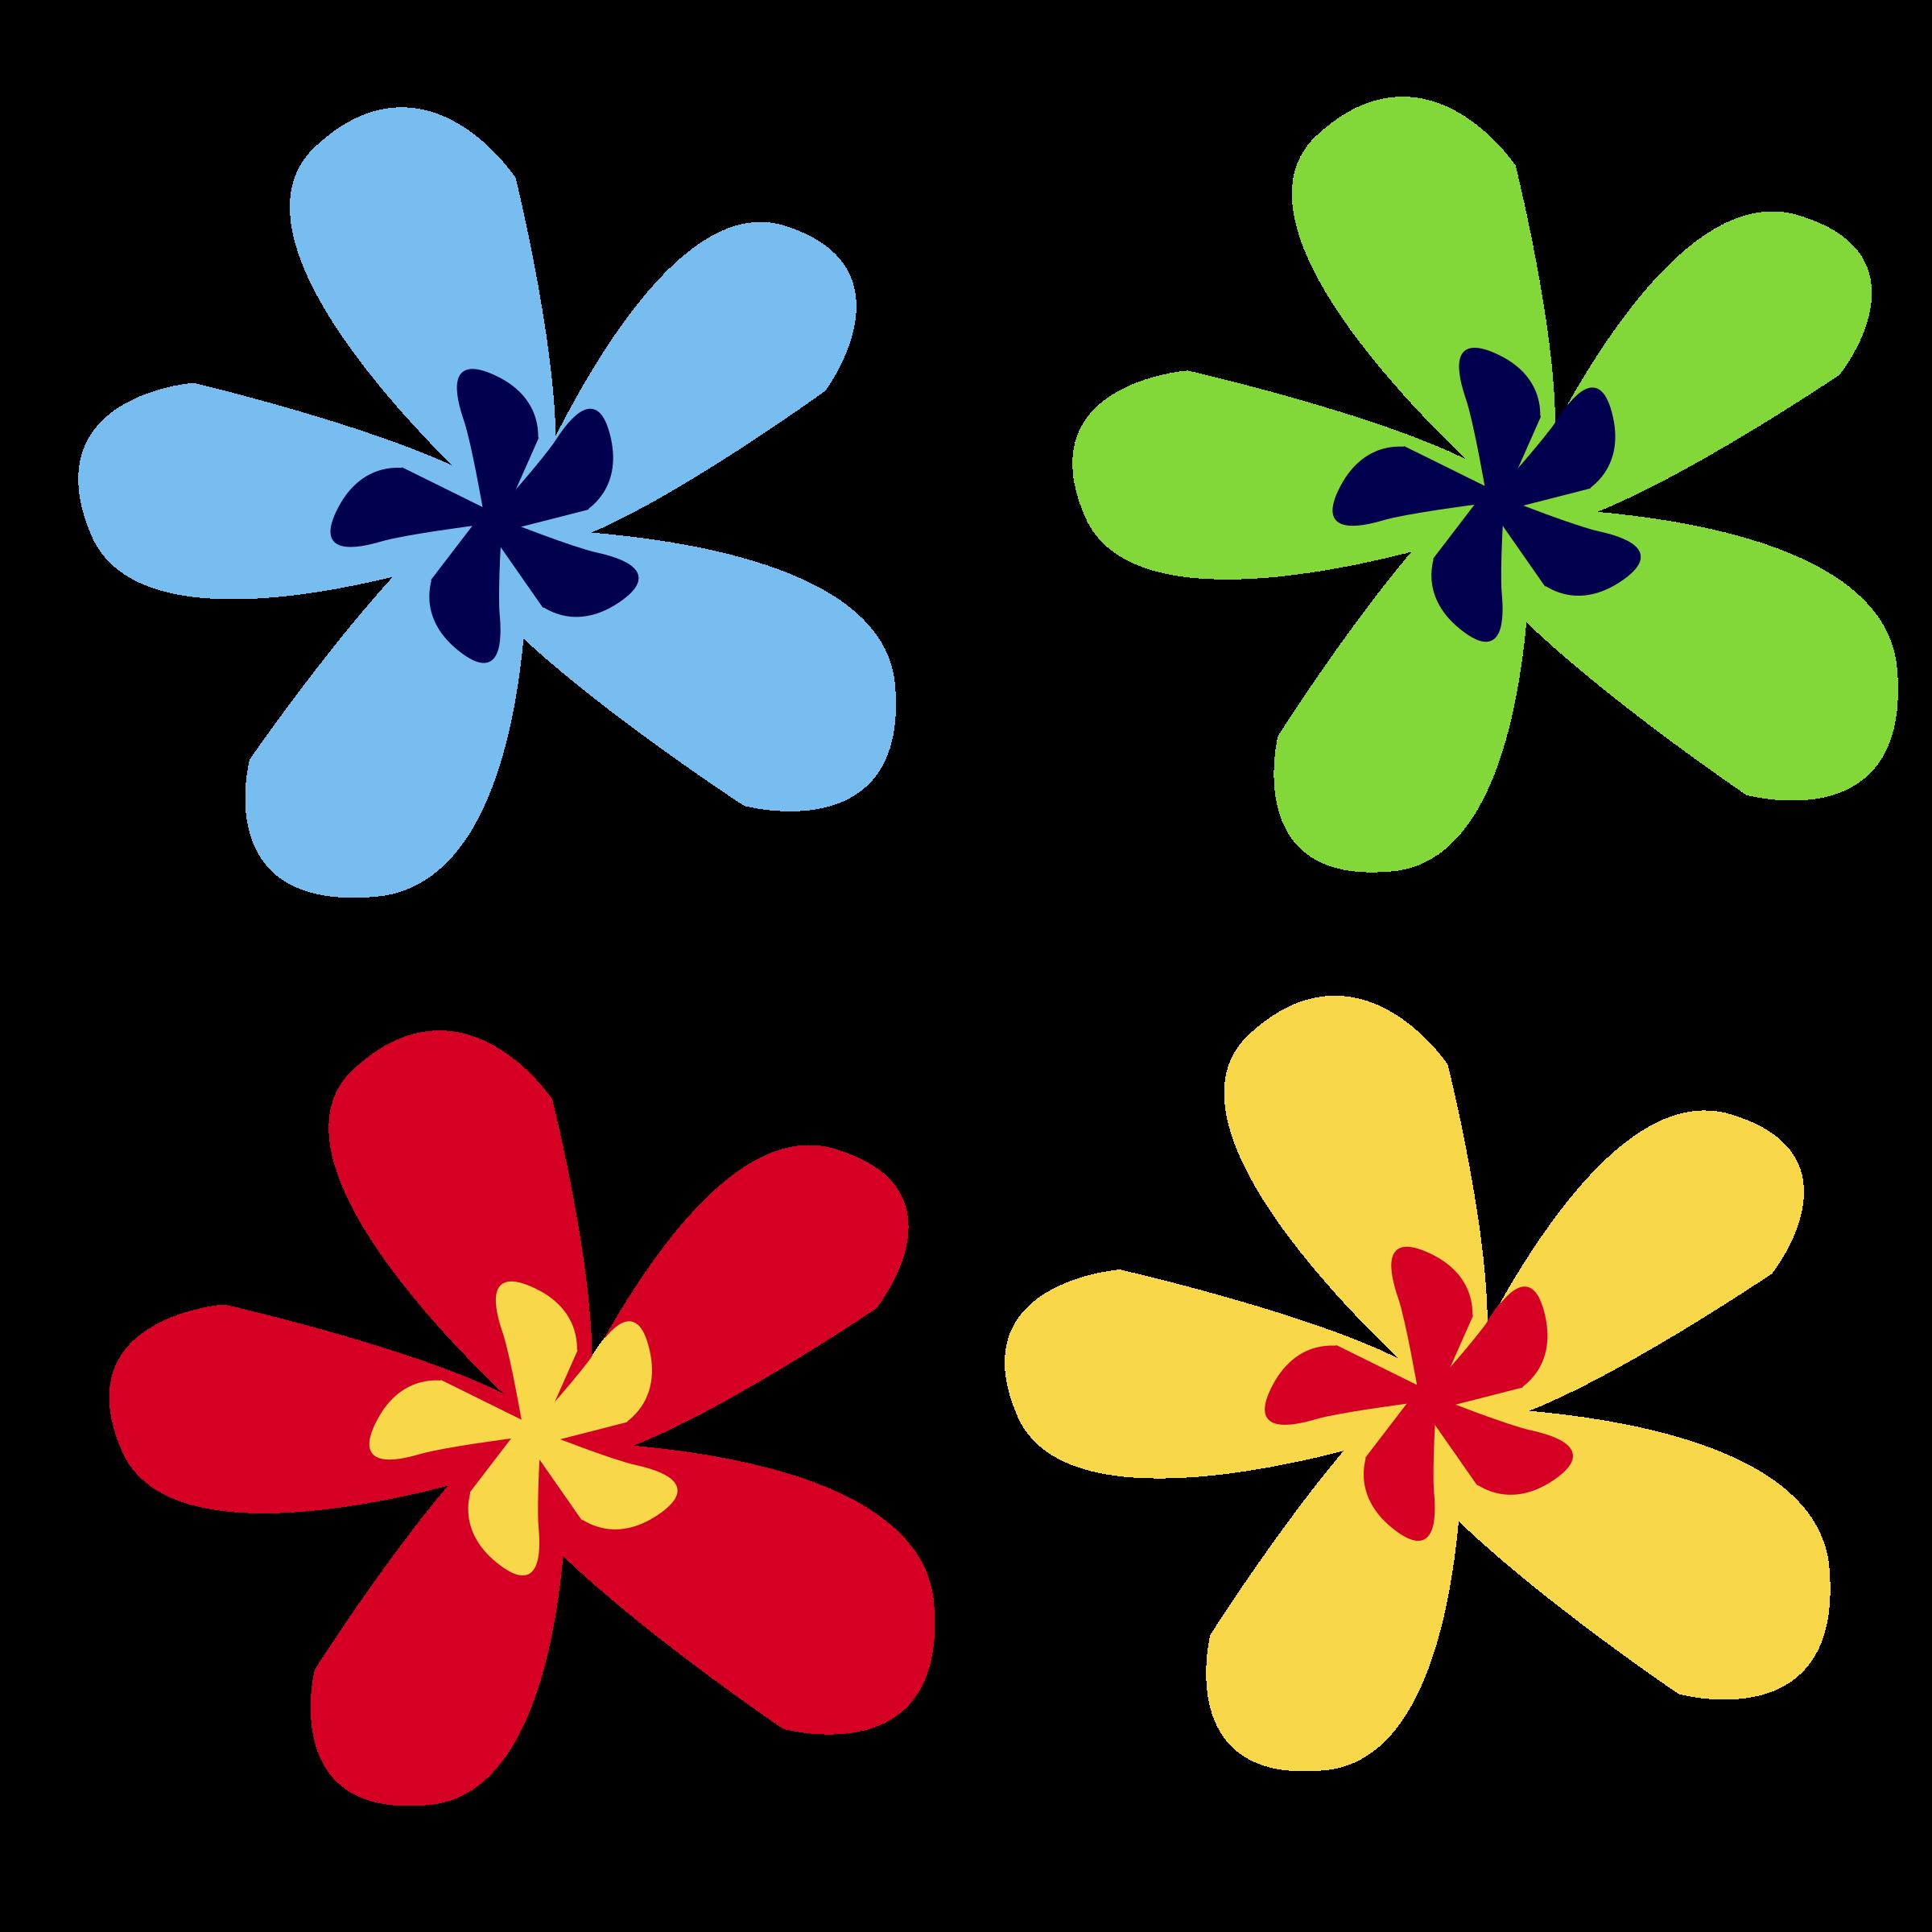 Flower clipart designs freeuse download Clipart - rainbow flower freeuse download